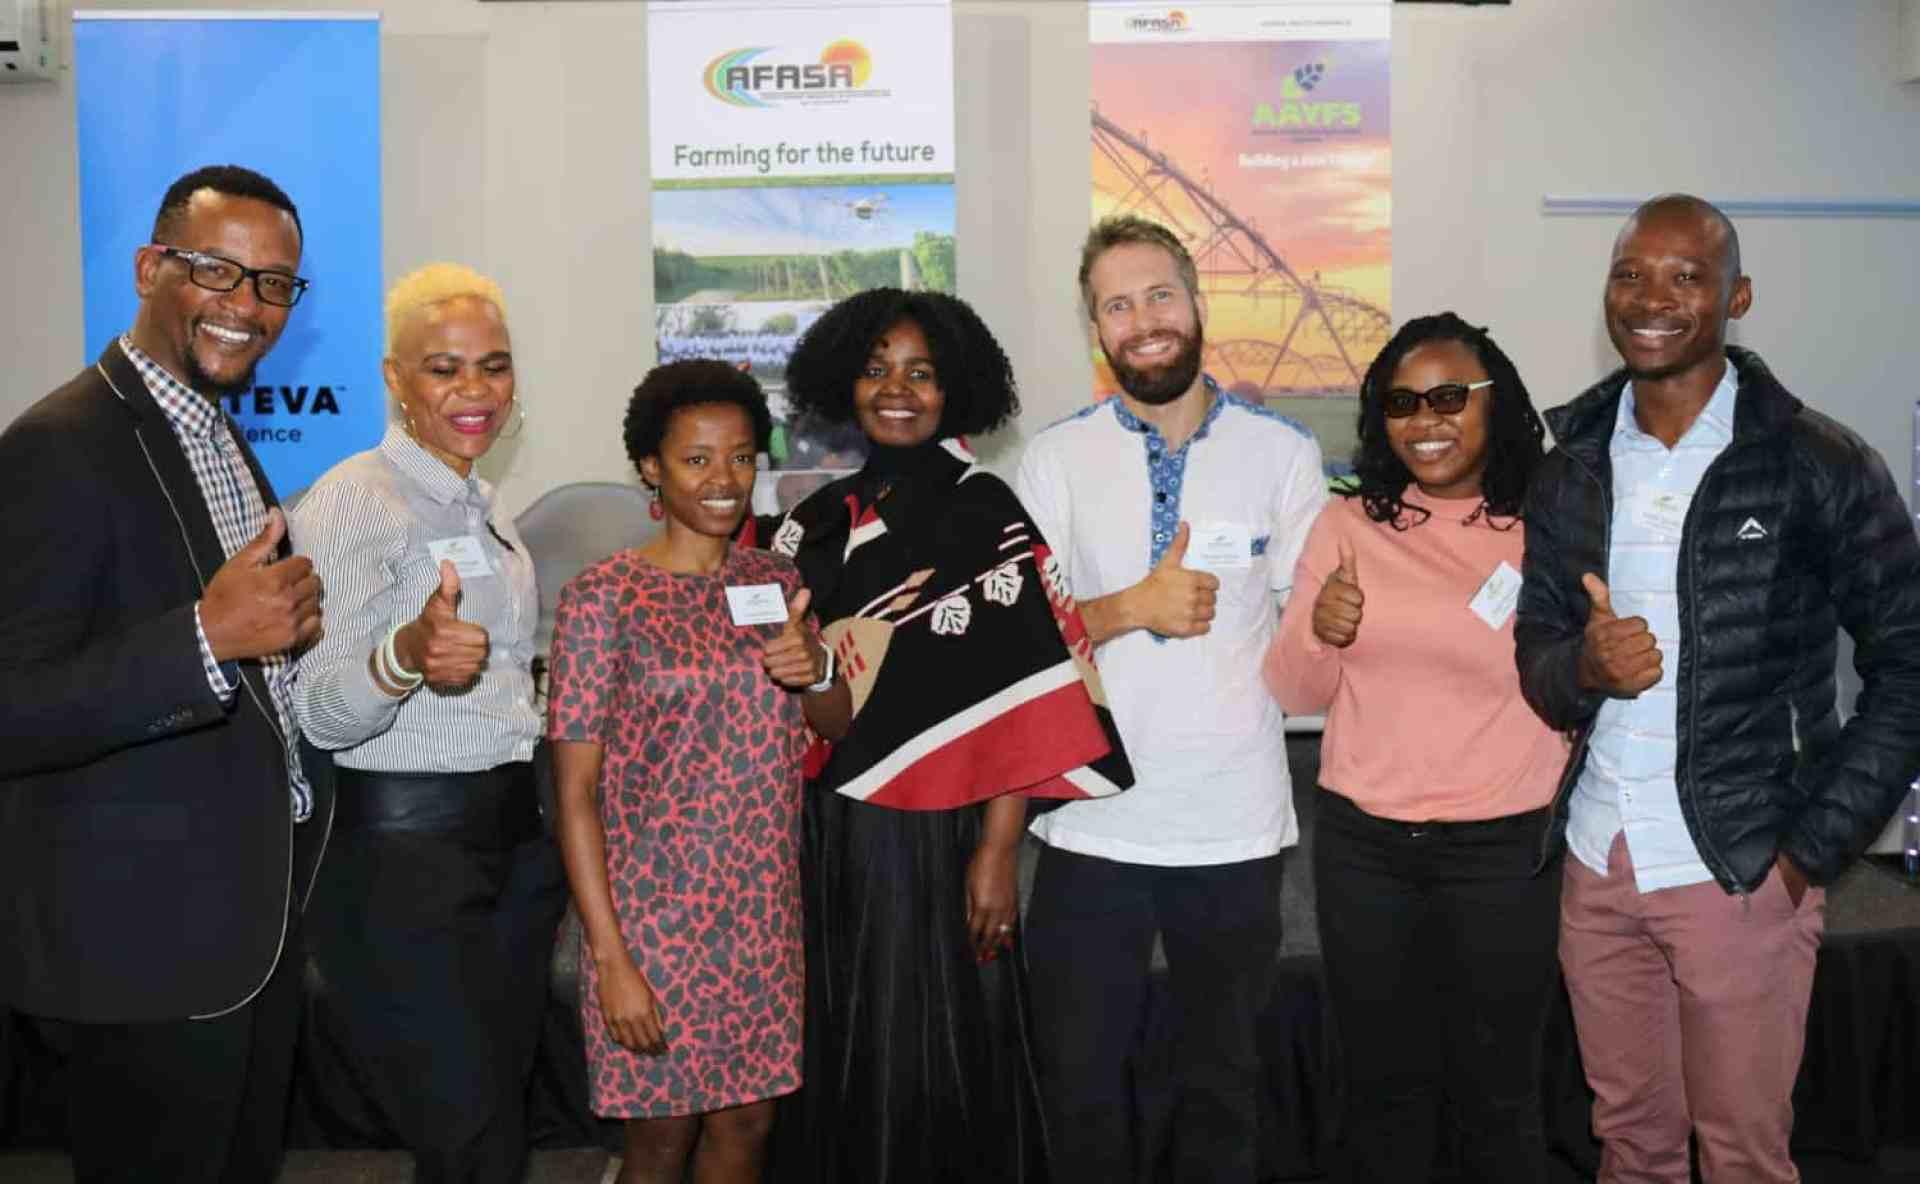 Tshiamo Dichabe, Karabo Rampete, Nono Sekhoto-Iga, Dr Vuyo Mahlati, Morgan John Brand, Andile Matukane and Andile Nqobo at the opening of the 2019 AAYFS.